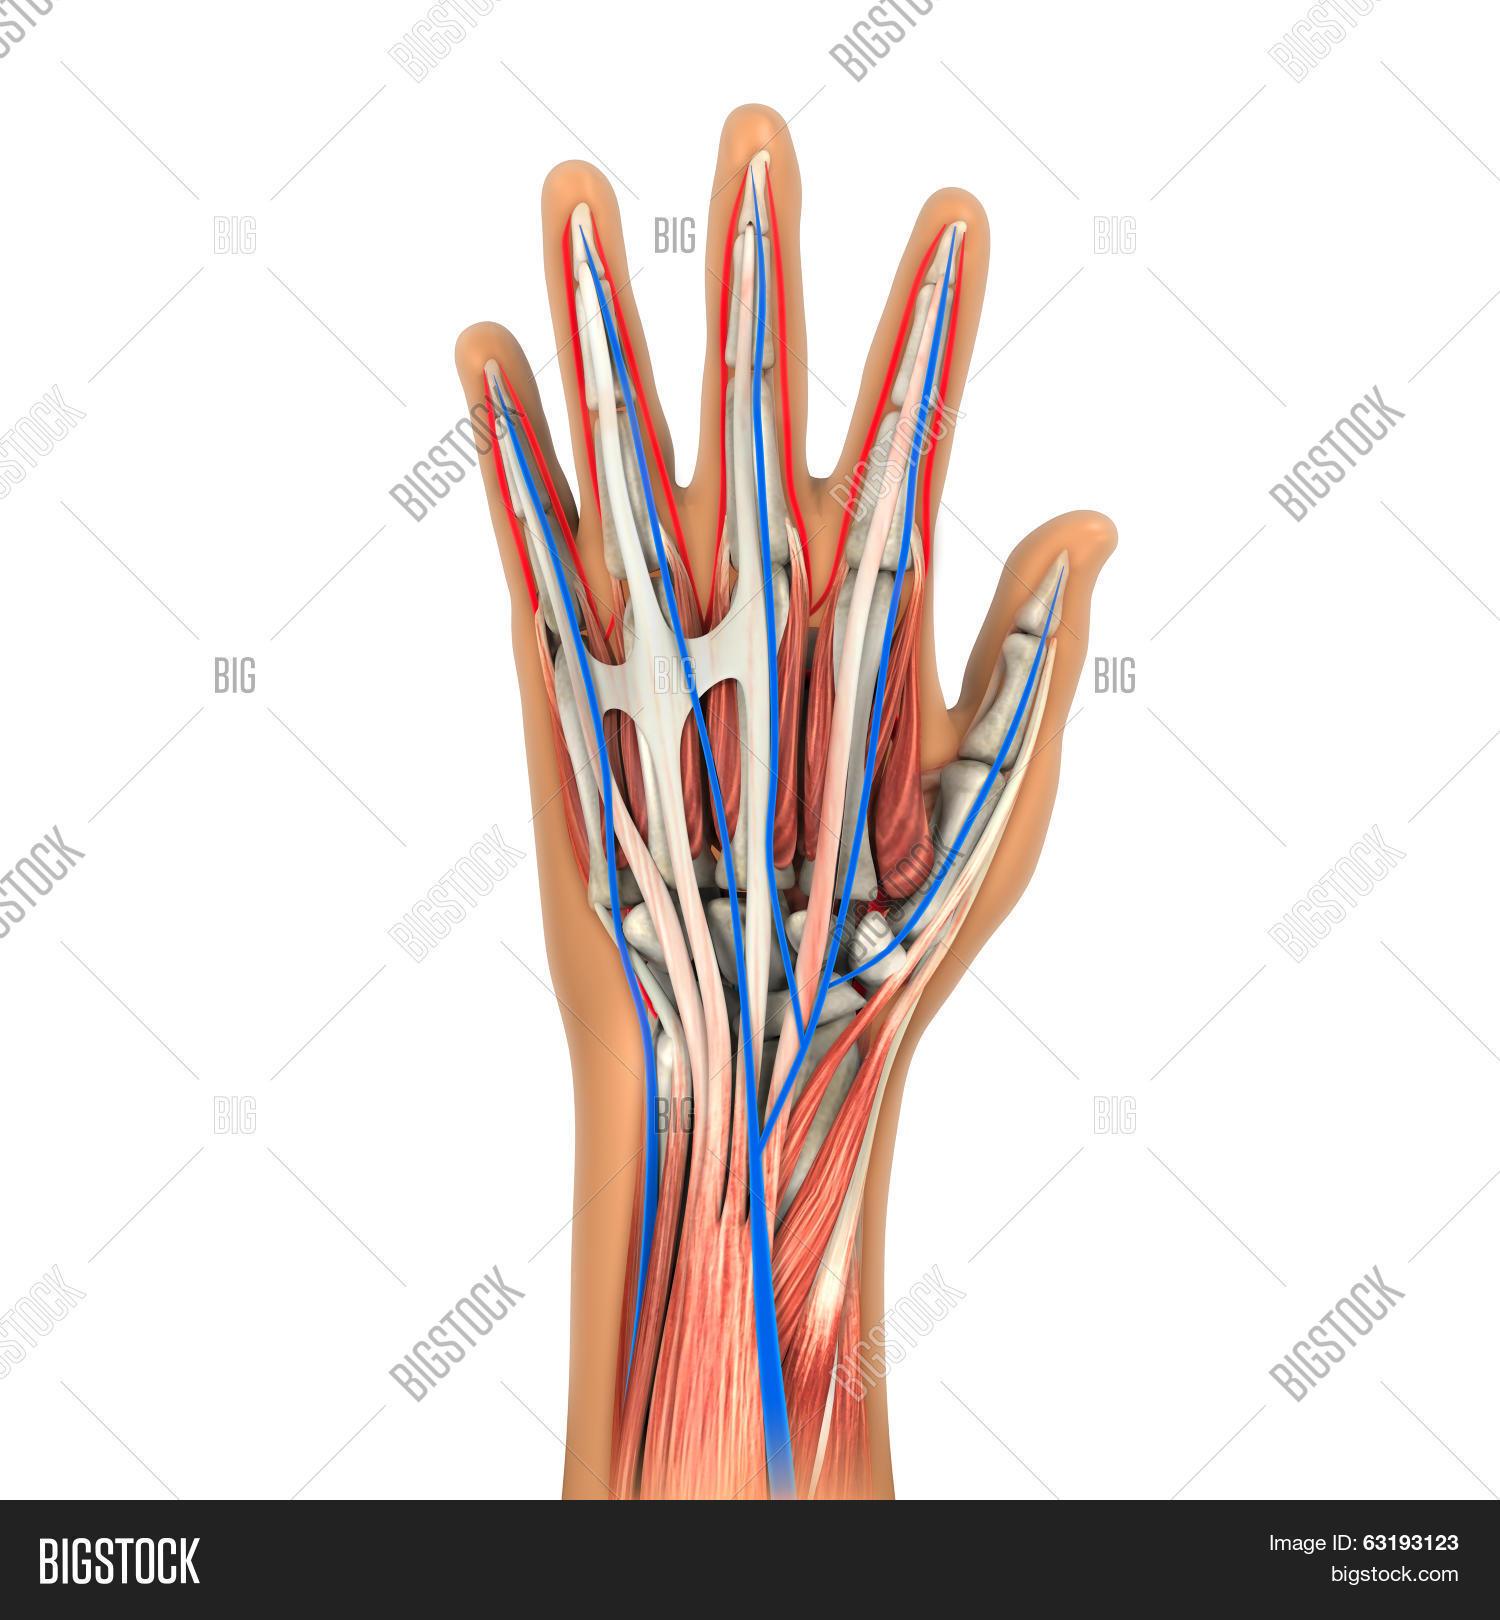 Human Hand Anatomy Image & Photo (Free Trial)   Bigstock